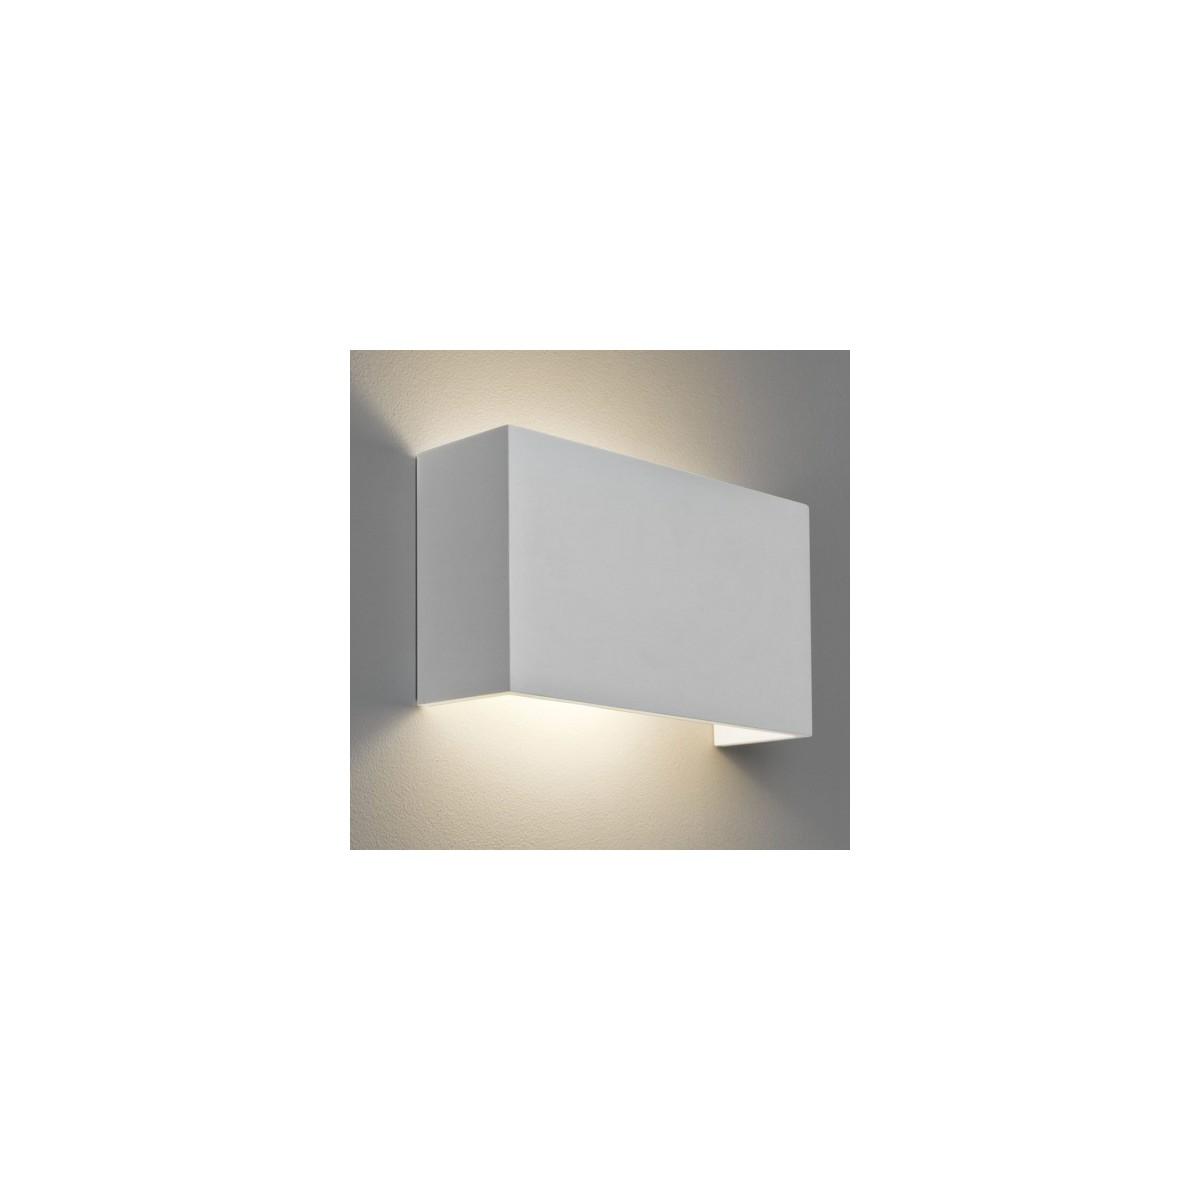 Astro Pella 325 Ścienna 1x12W Max LED E27 Gips 1315001